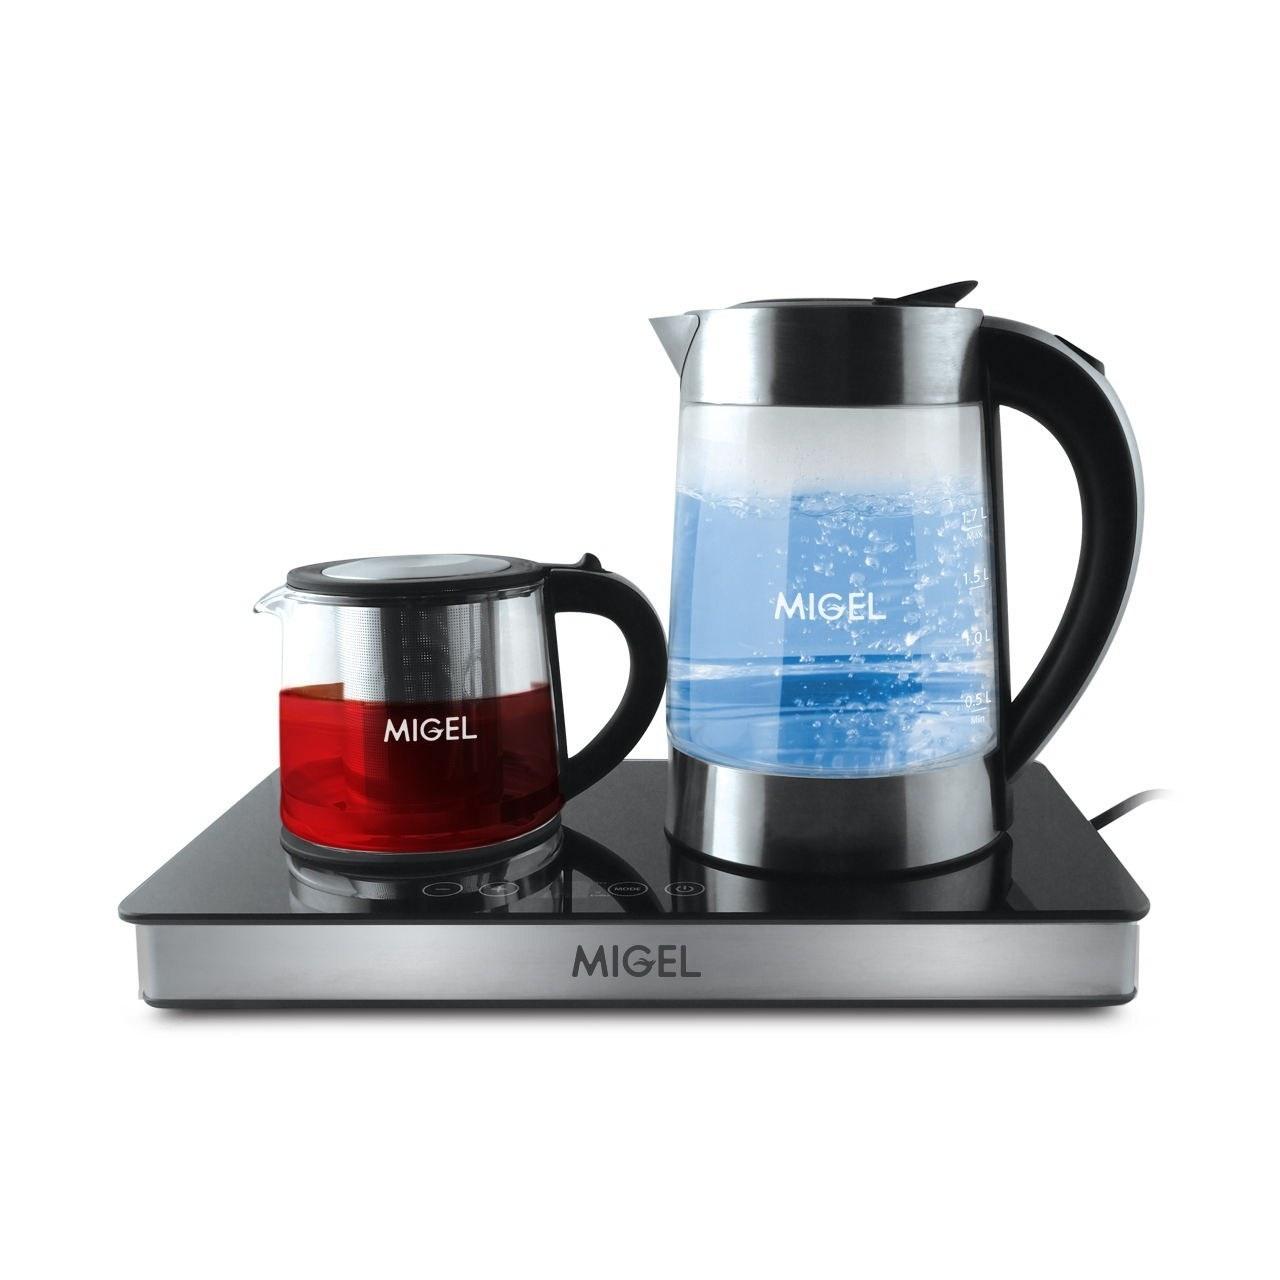 تصویر چای ساز میگل مدل GTS 122 Migel GTS 122 Tea Maker